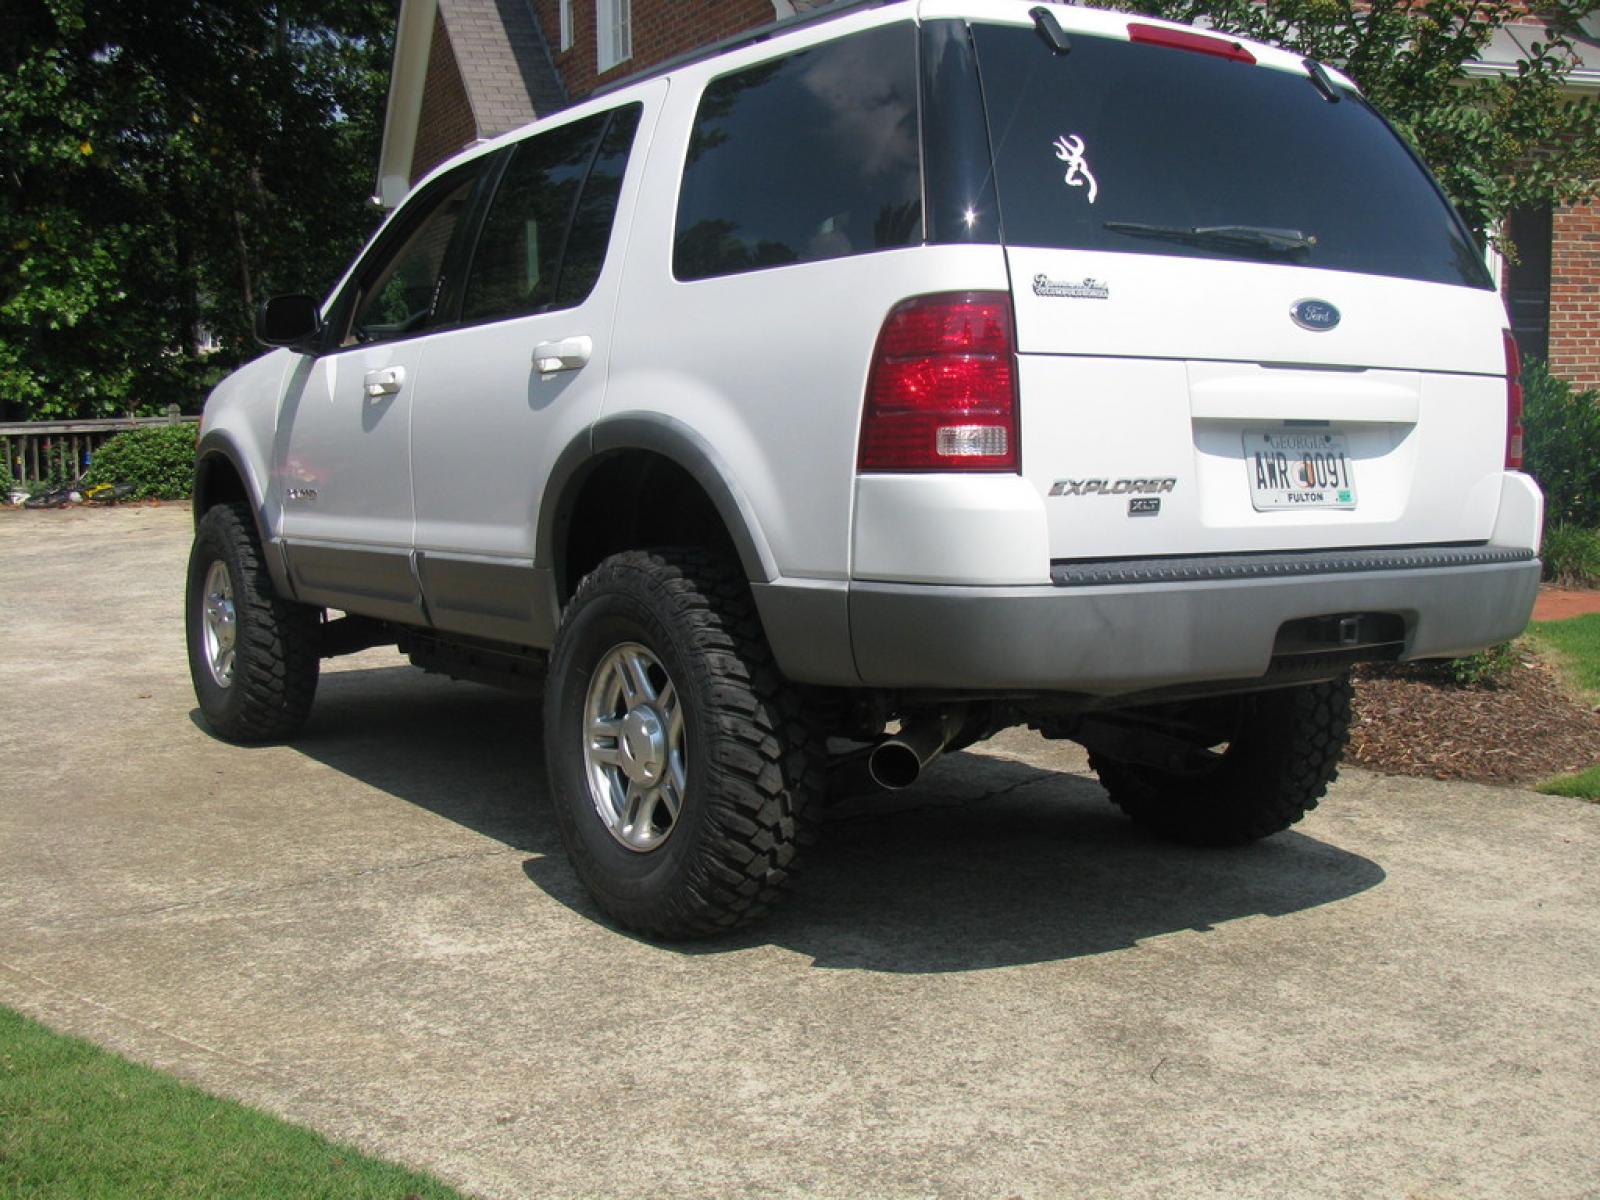 800 1024 1280 1600 origin 2002 ford explorer